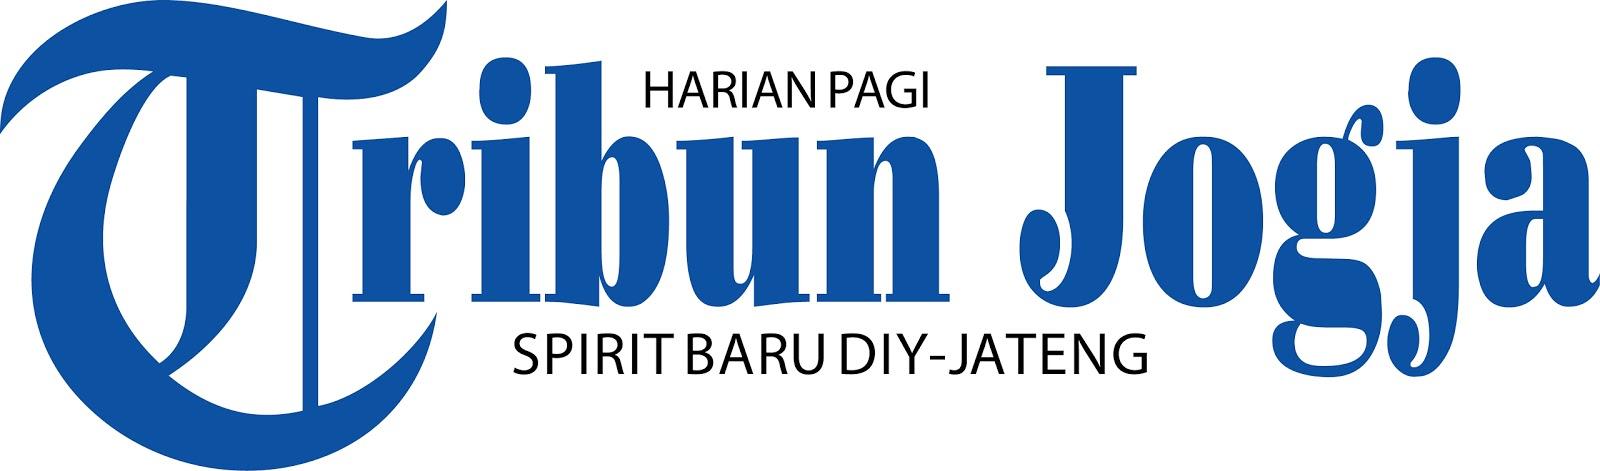 Info Cpns 2014 Kabupaten Kupang Lowongan Cpns Pati Kab Agustus 2016 Terbaru Pusat Info Lowongan Terkini Lowongan Terbaru Terupdate